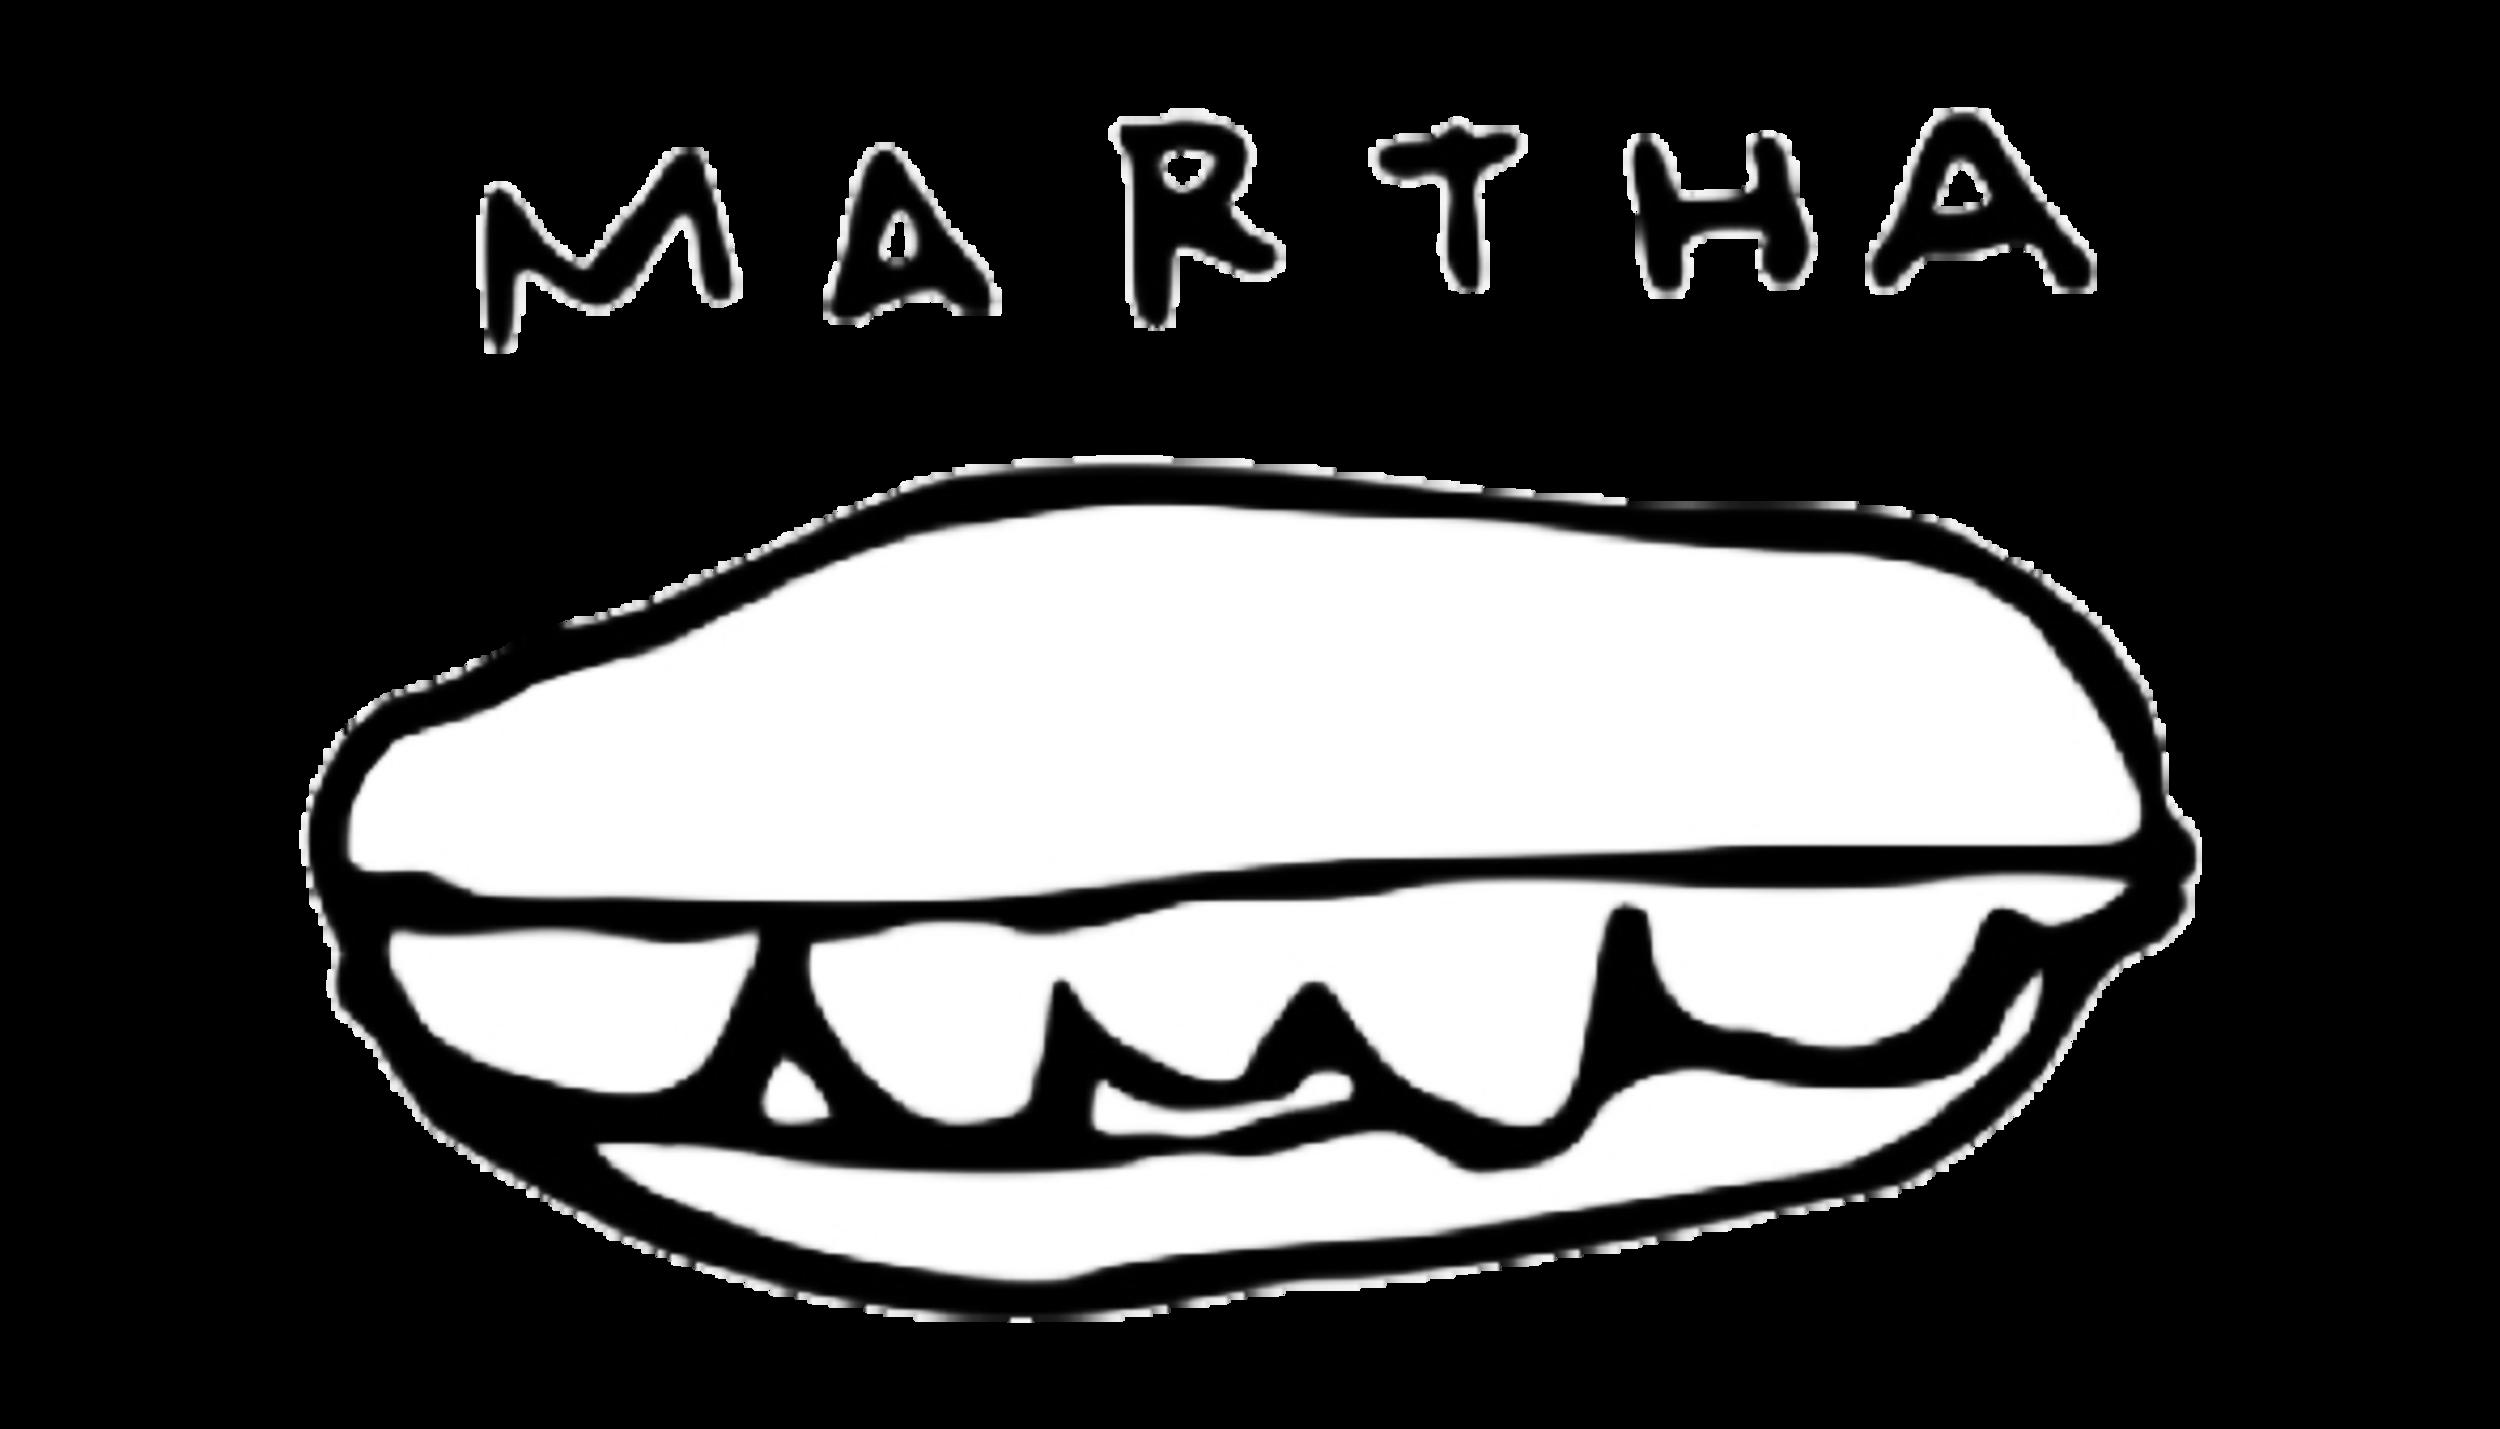 Martha_LOGO.png